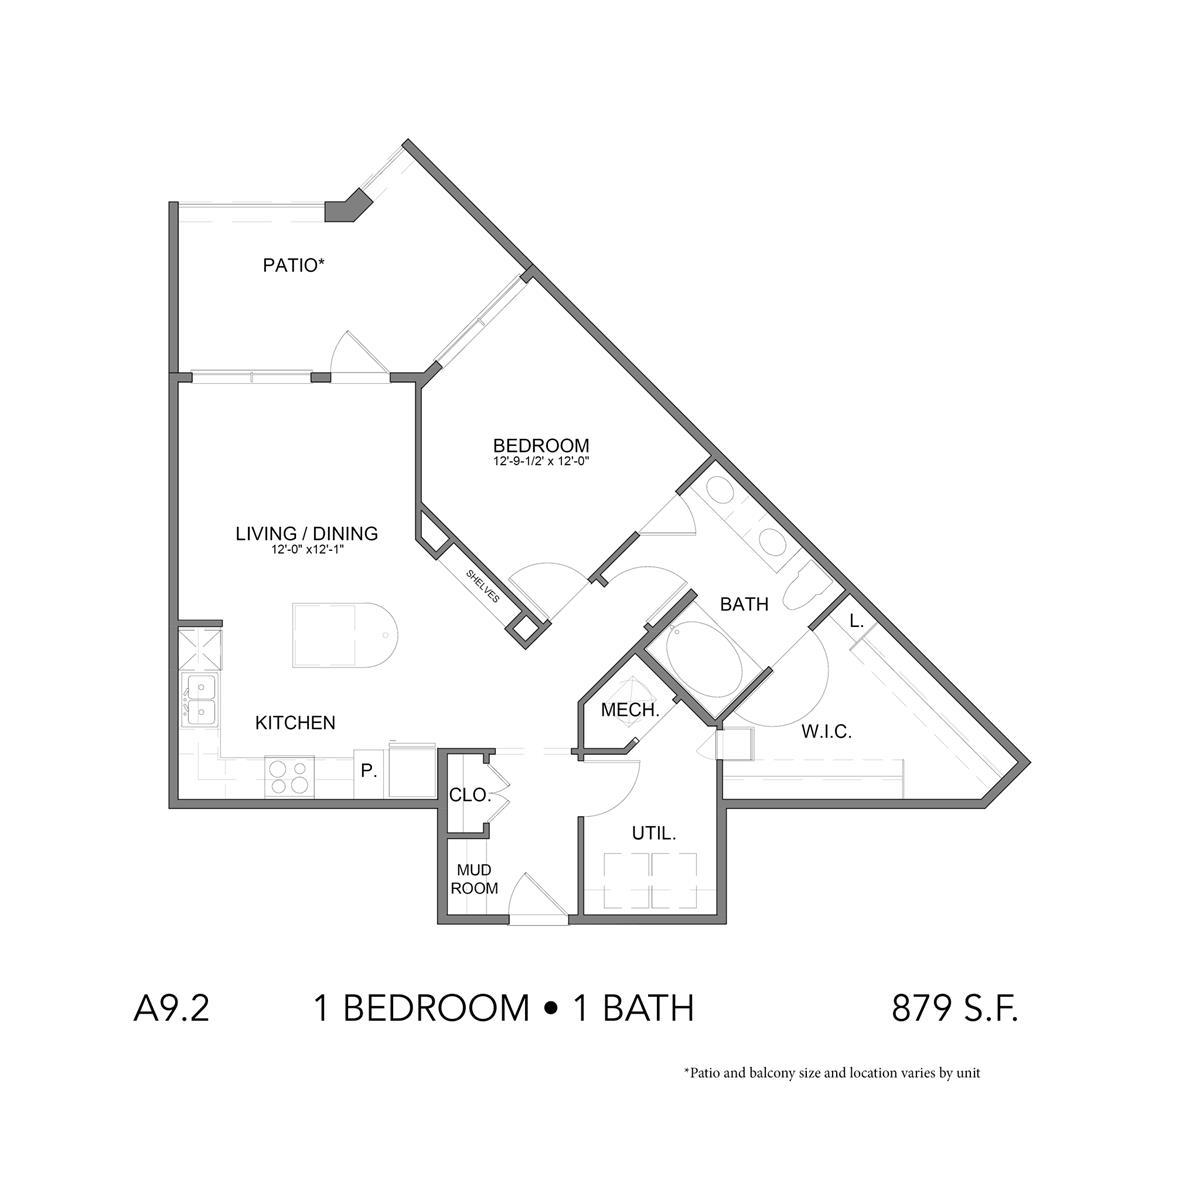 879 sq. ft. A9.2 floor plan